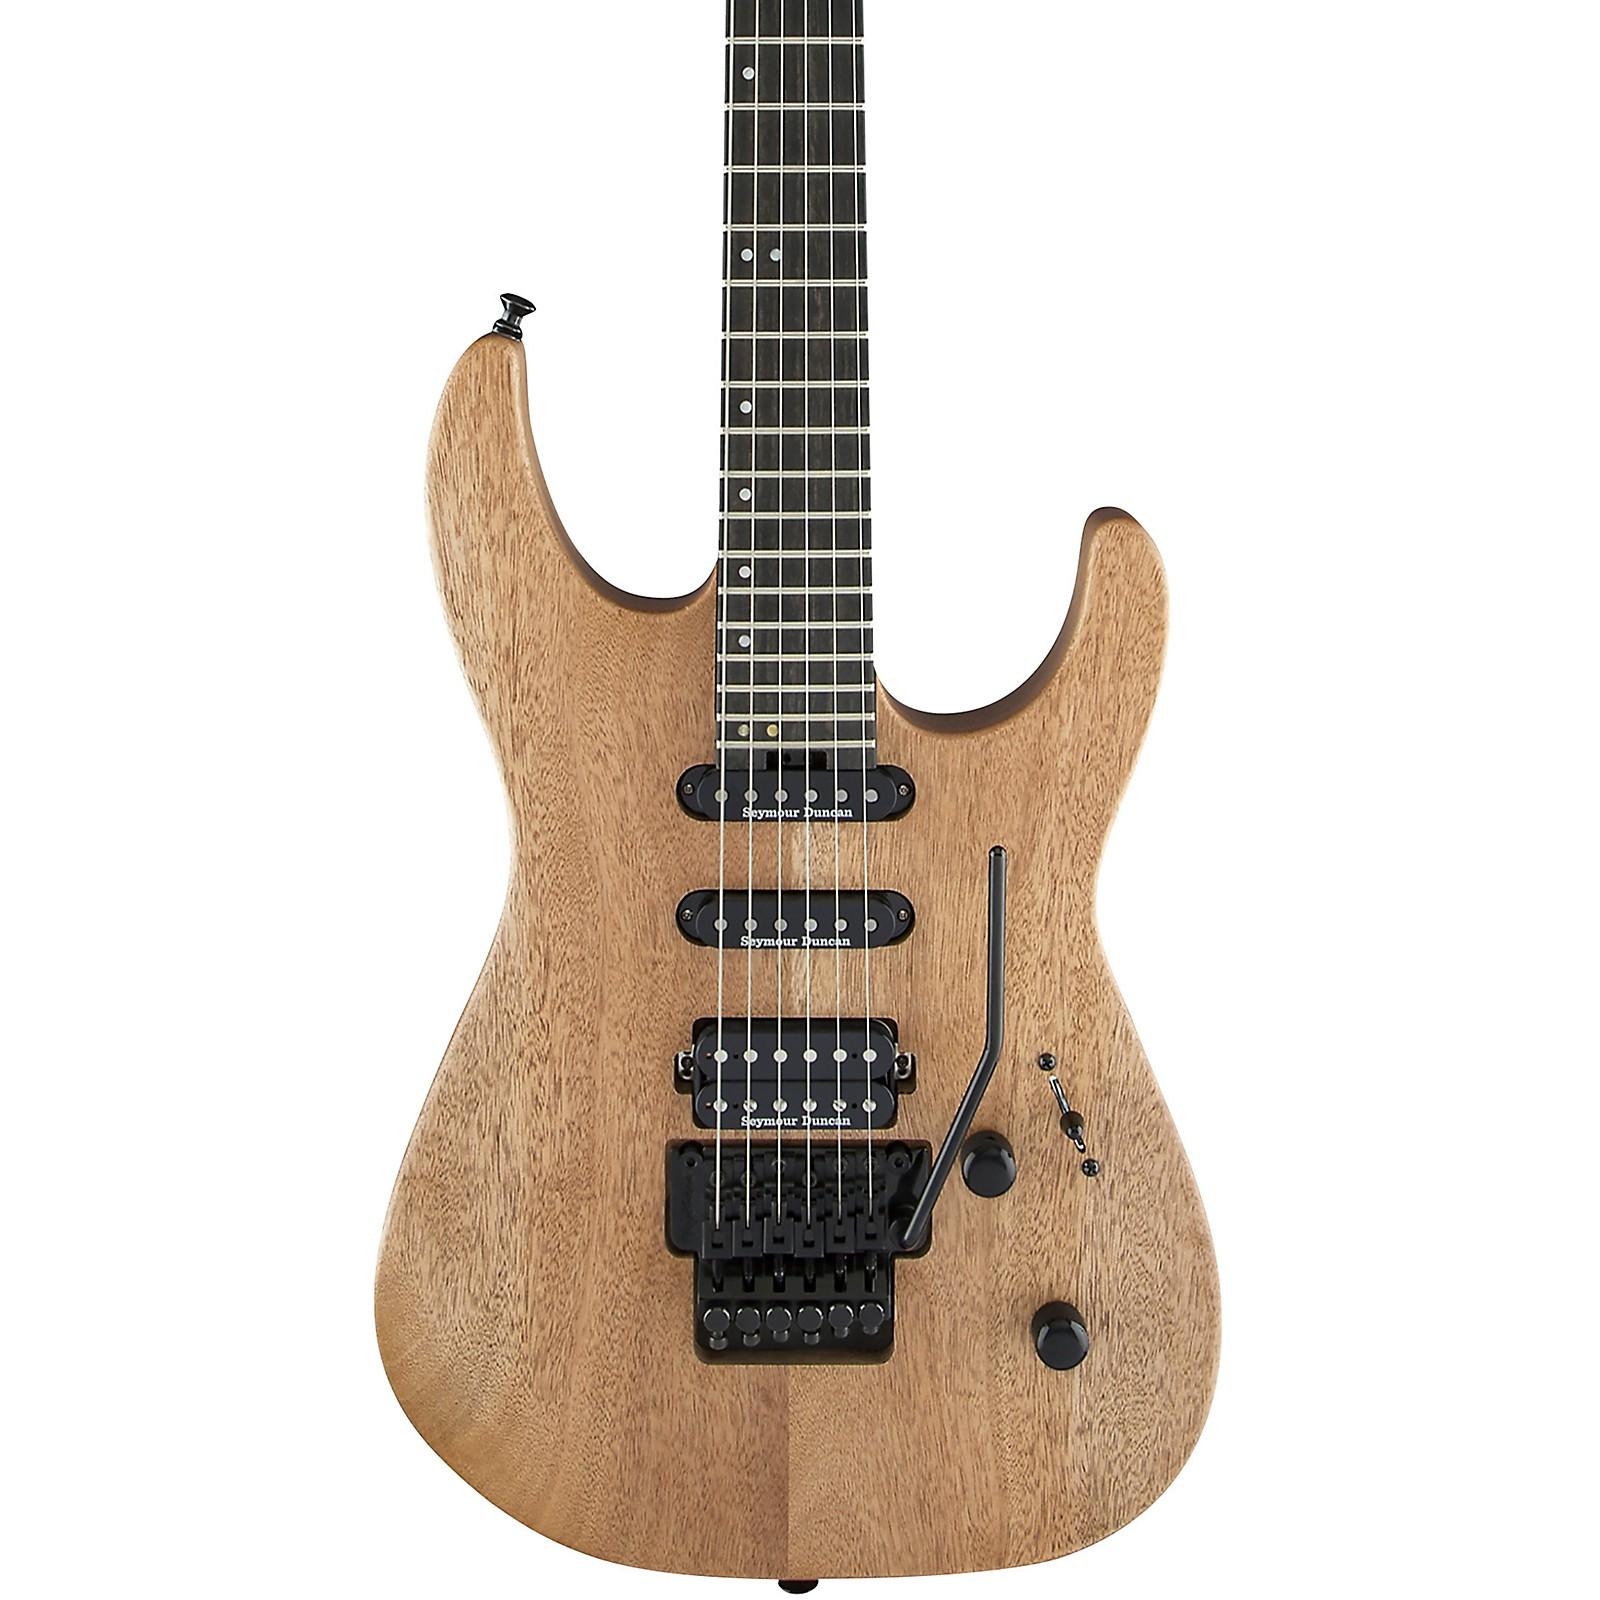 Jackson Pro Series Dinky DK3 Okoume Electric Guitar